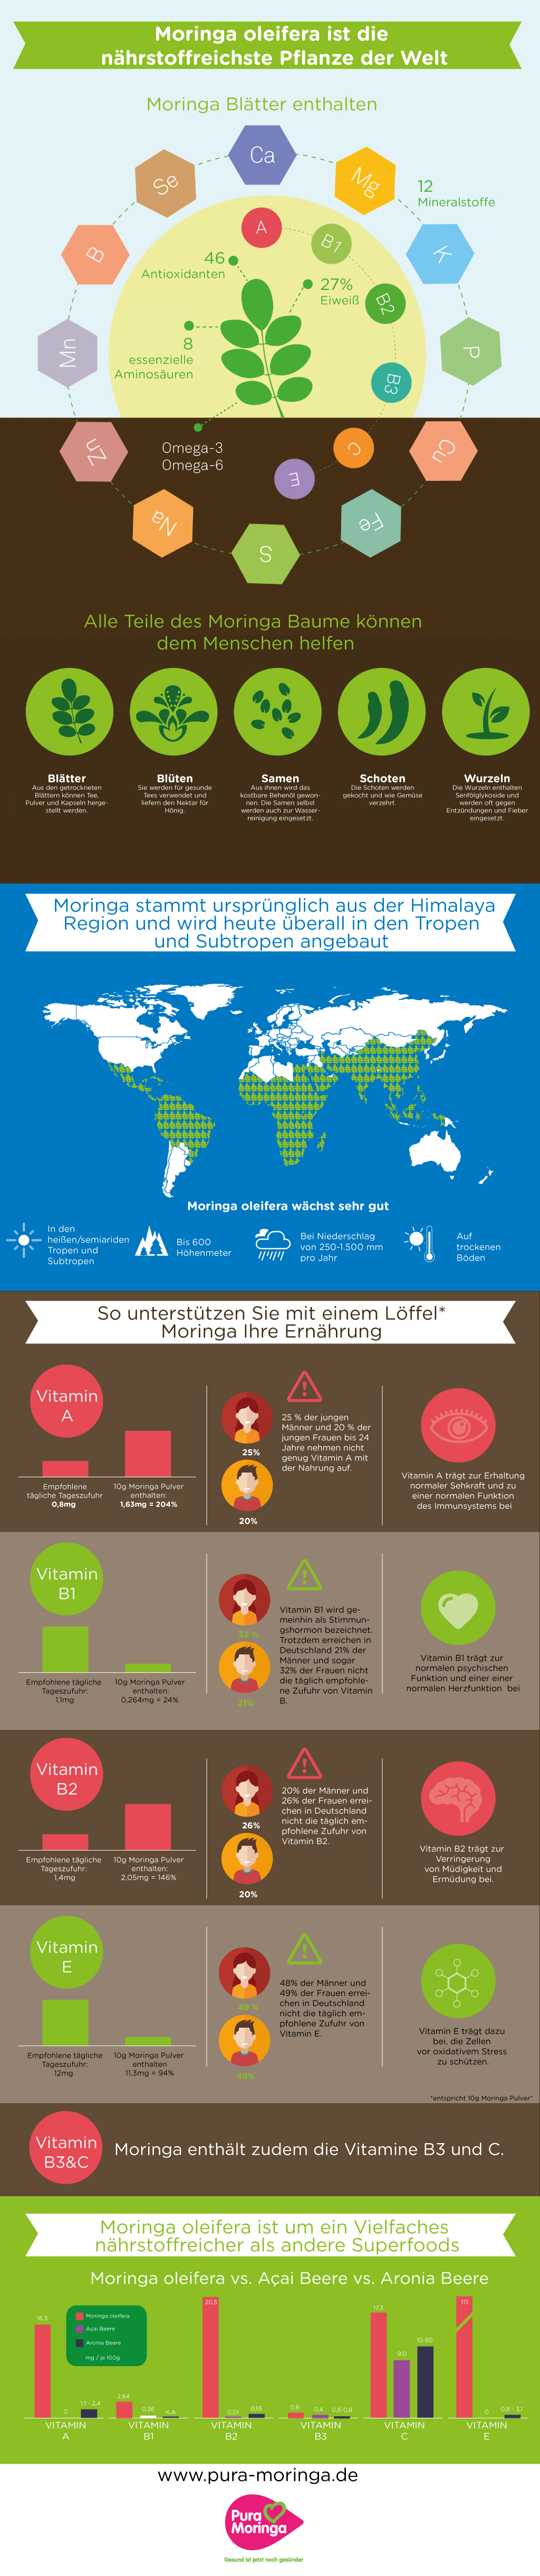 Moringa Infografik: Moringa oleifera ist die nährstoffreichste Pflanze der Welt